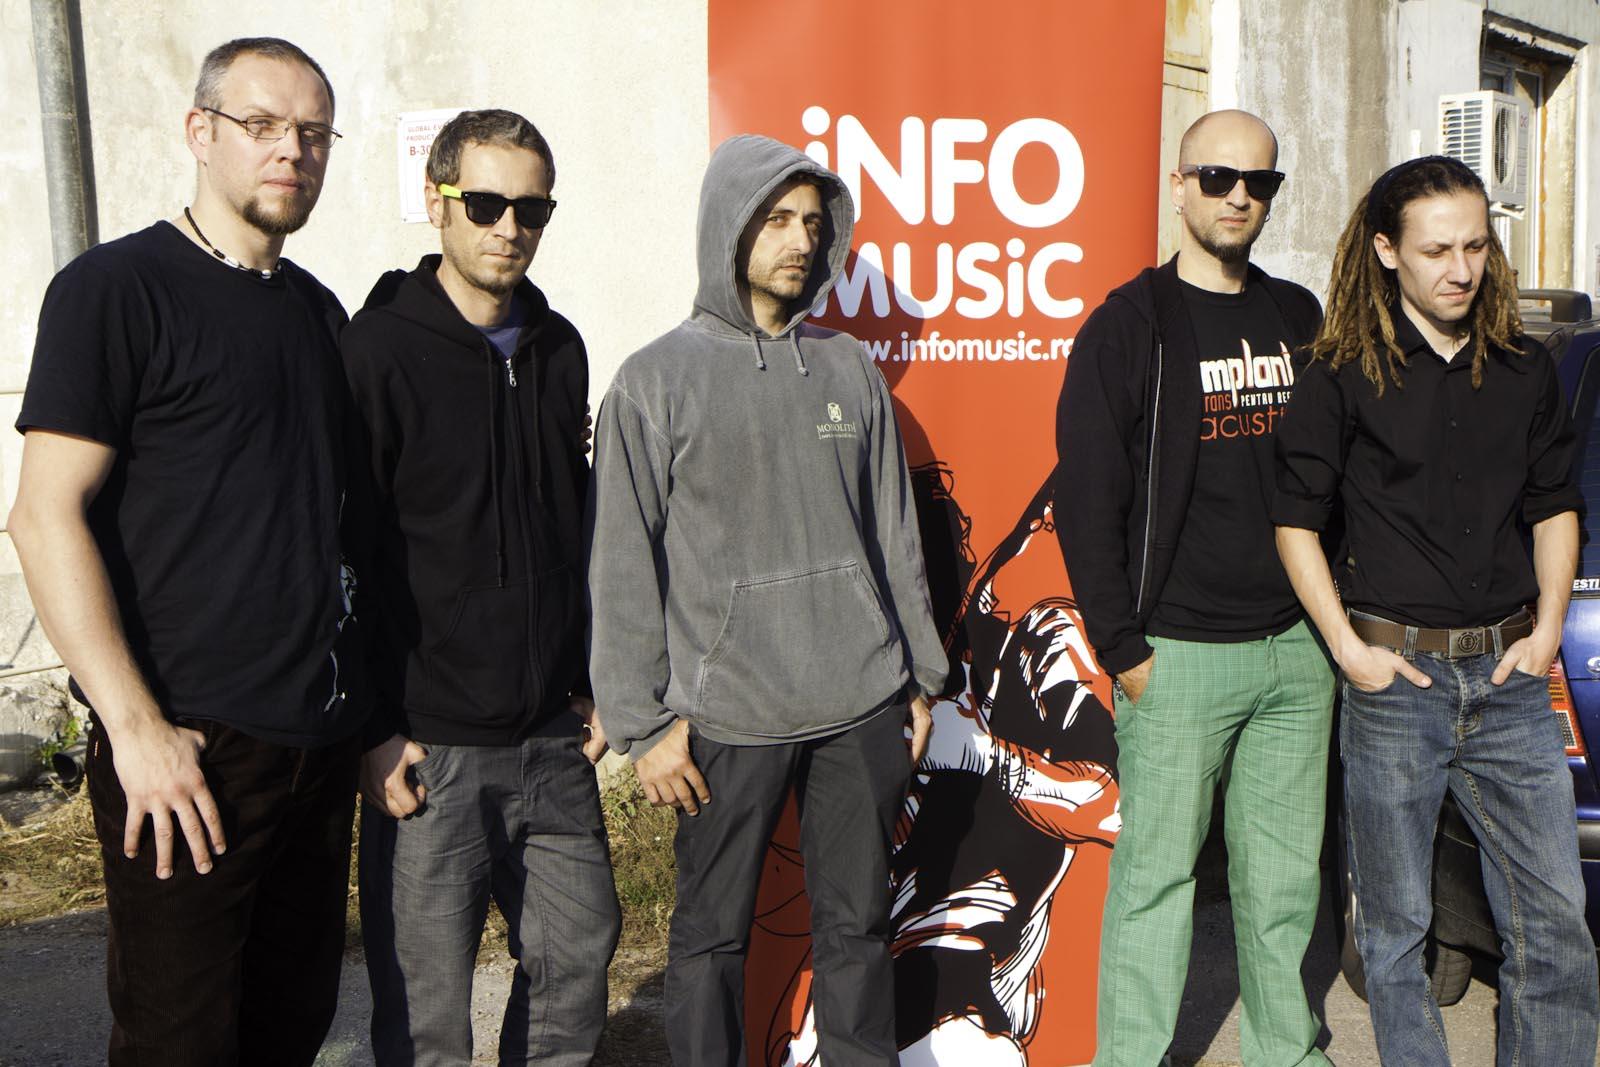 Implant pentru refuz - interviu Infomusic.ro